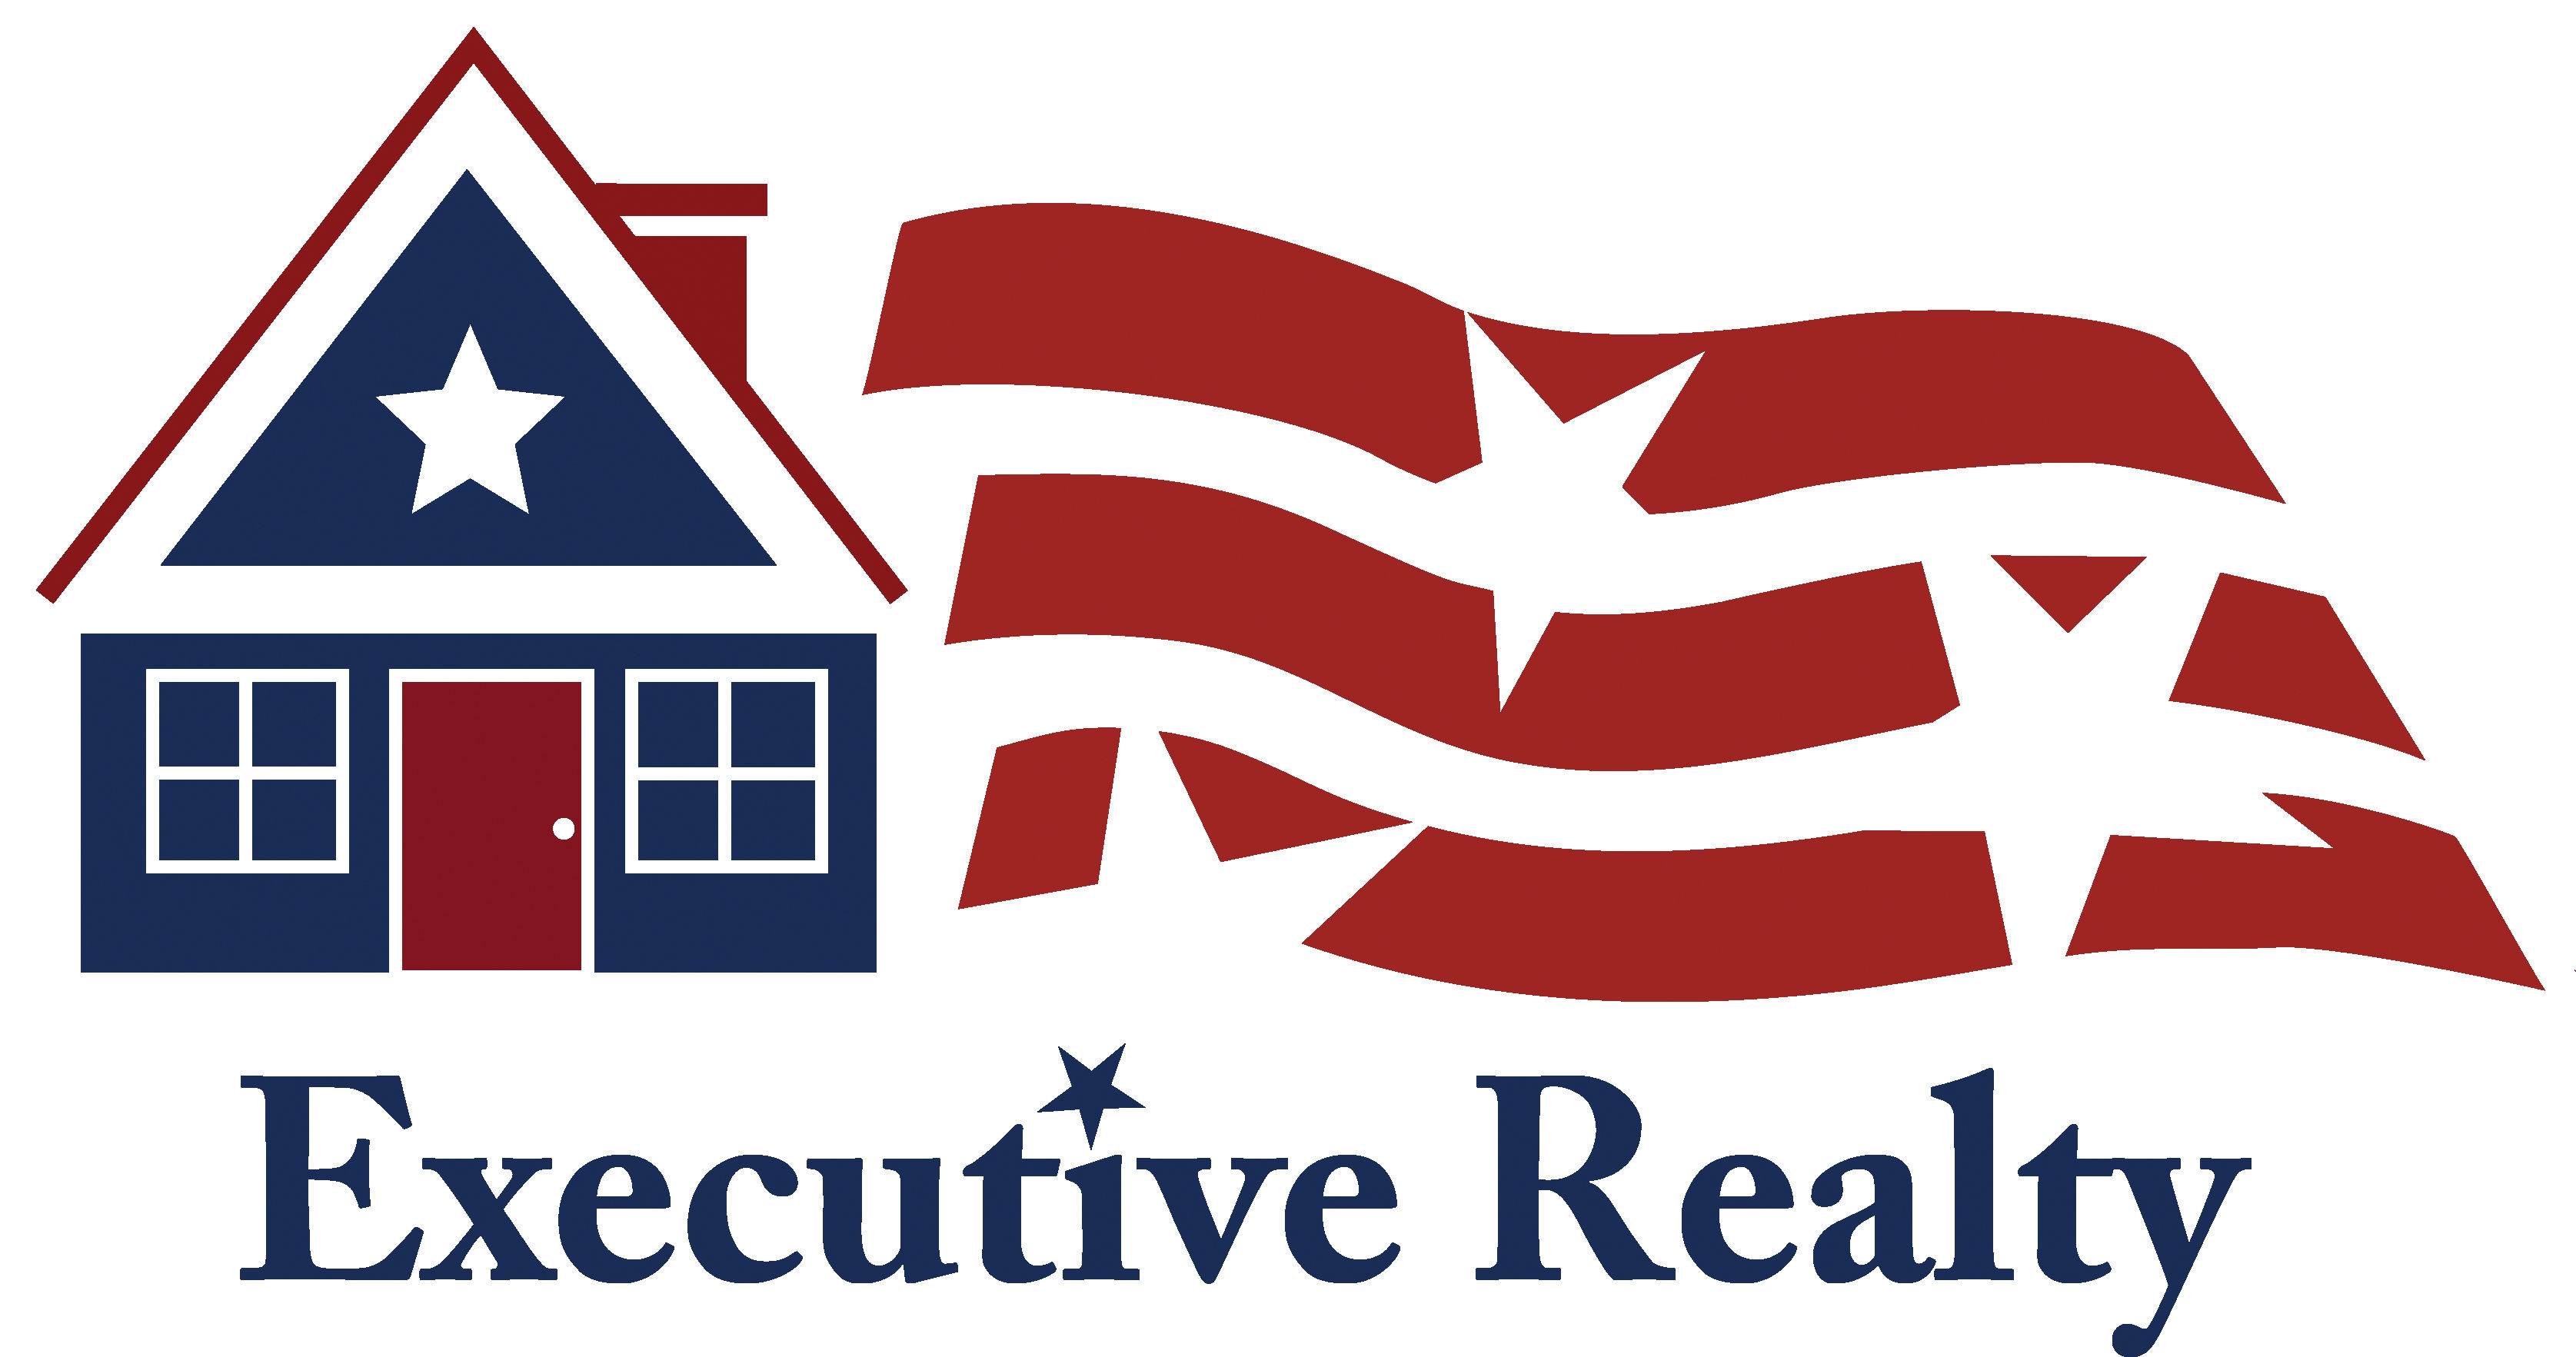 Executive Realty